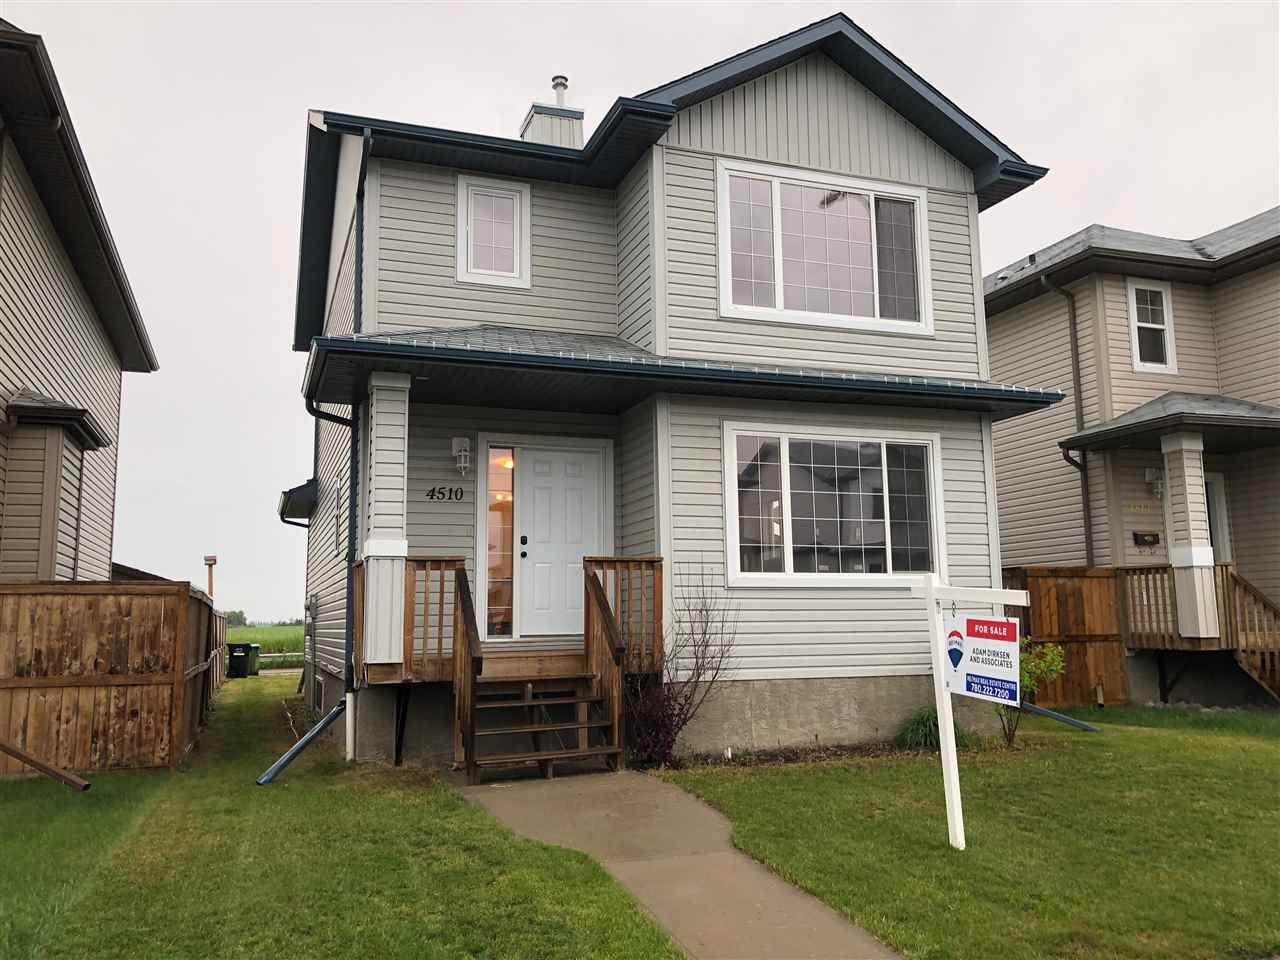 Main Photo: 4510 75 Street: Camrose House for sale : MLS®# E4163324